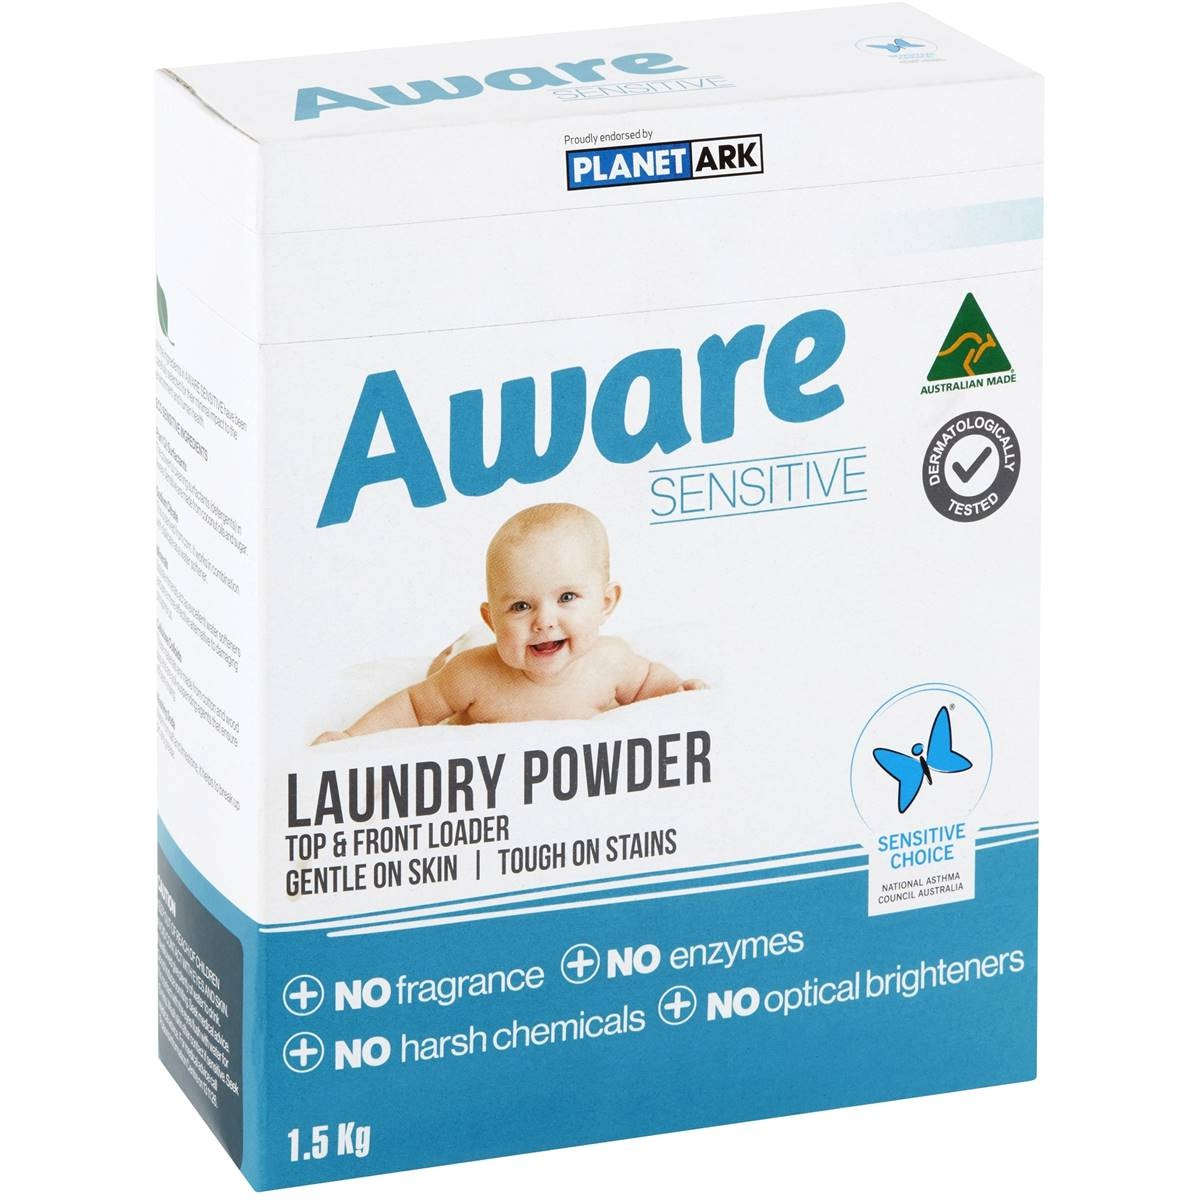 Aware Detergent Powder Sensitive 1.5kg - AWARE - Baby Need - in Sri Lanka